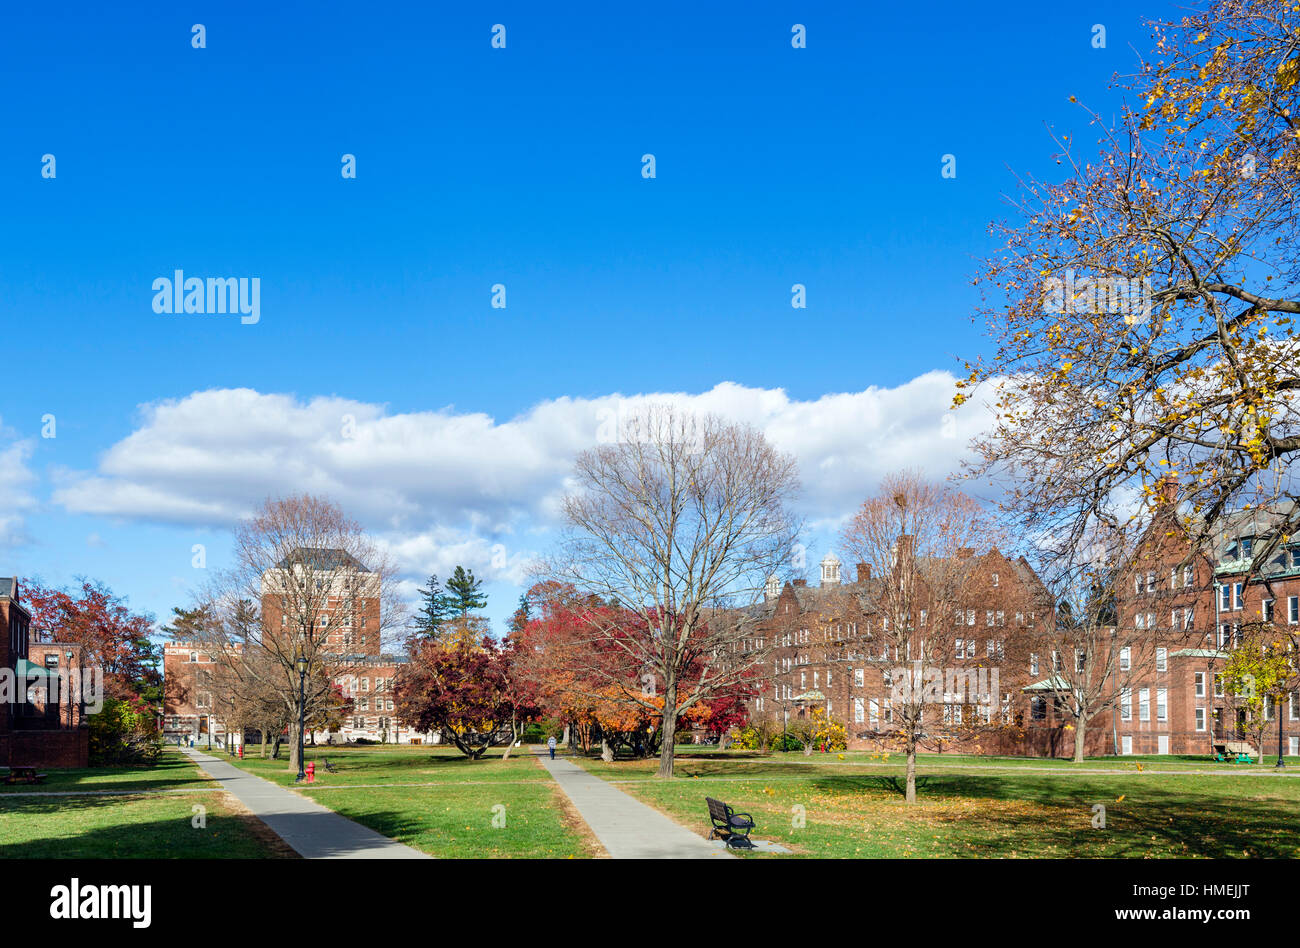 Vassar College, Poughkeepsie, New York State, USA - Stock Image